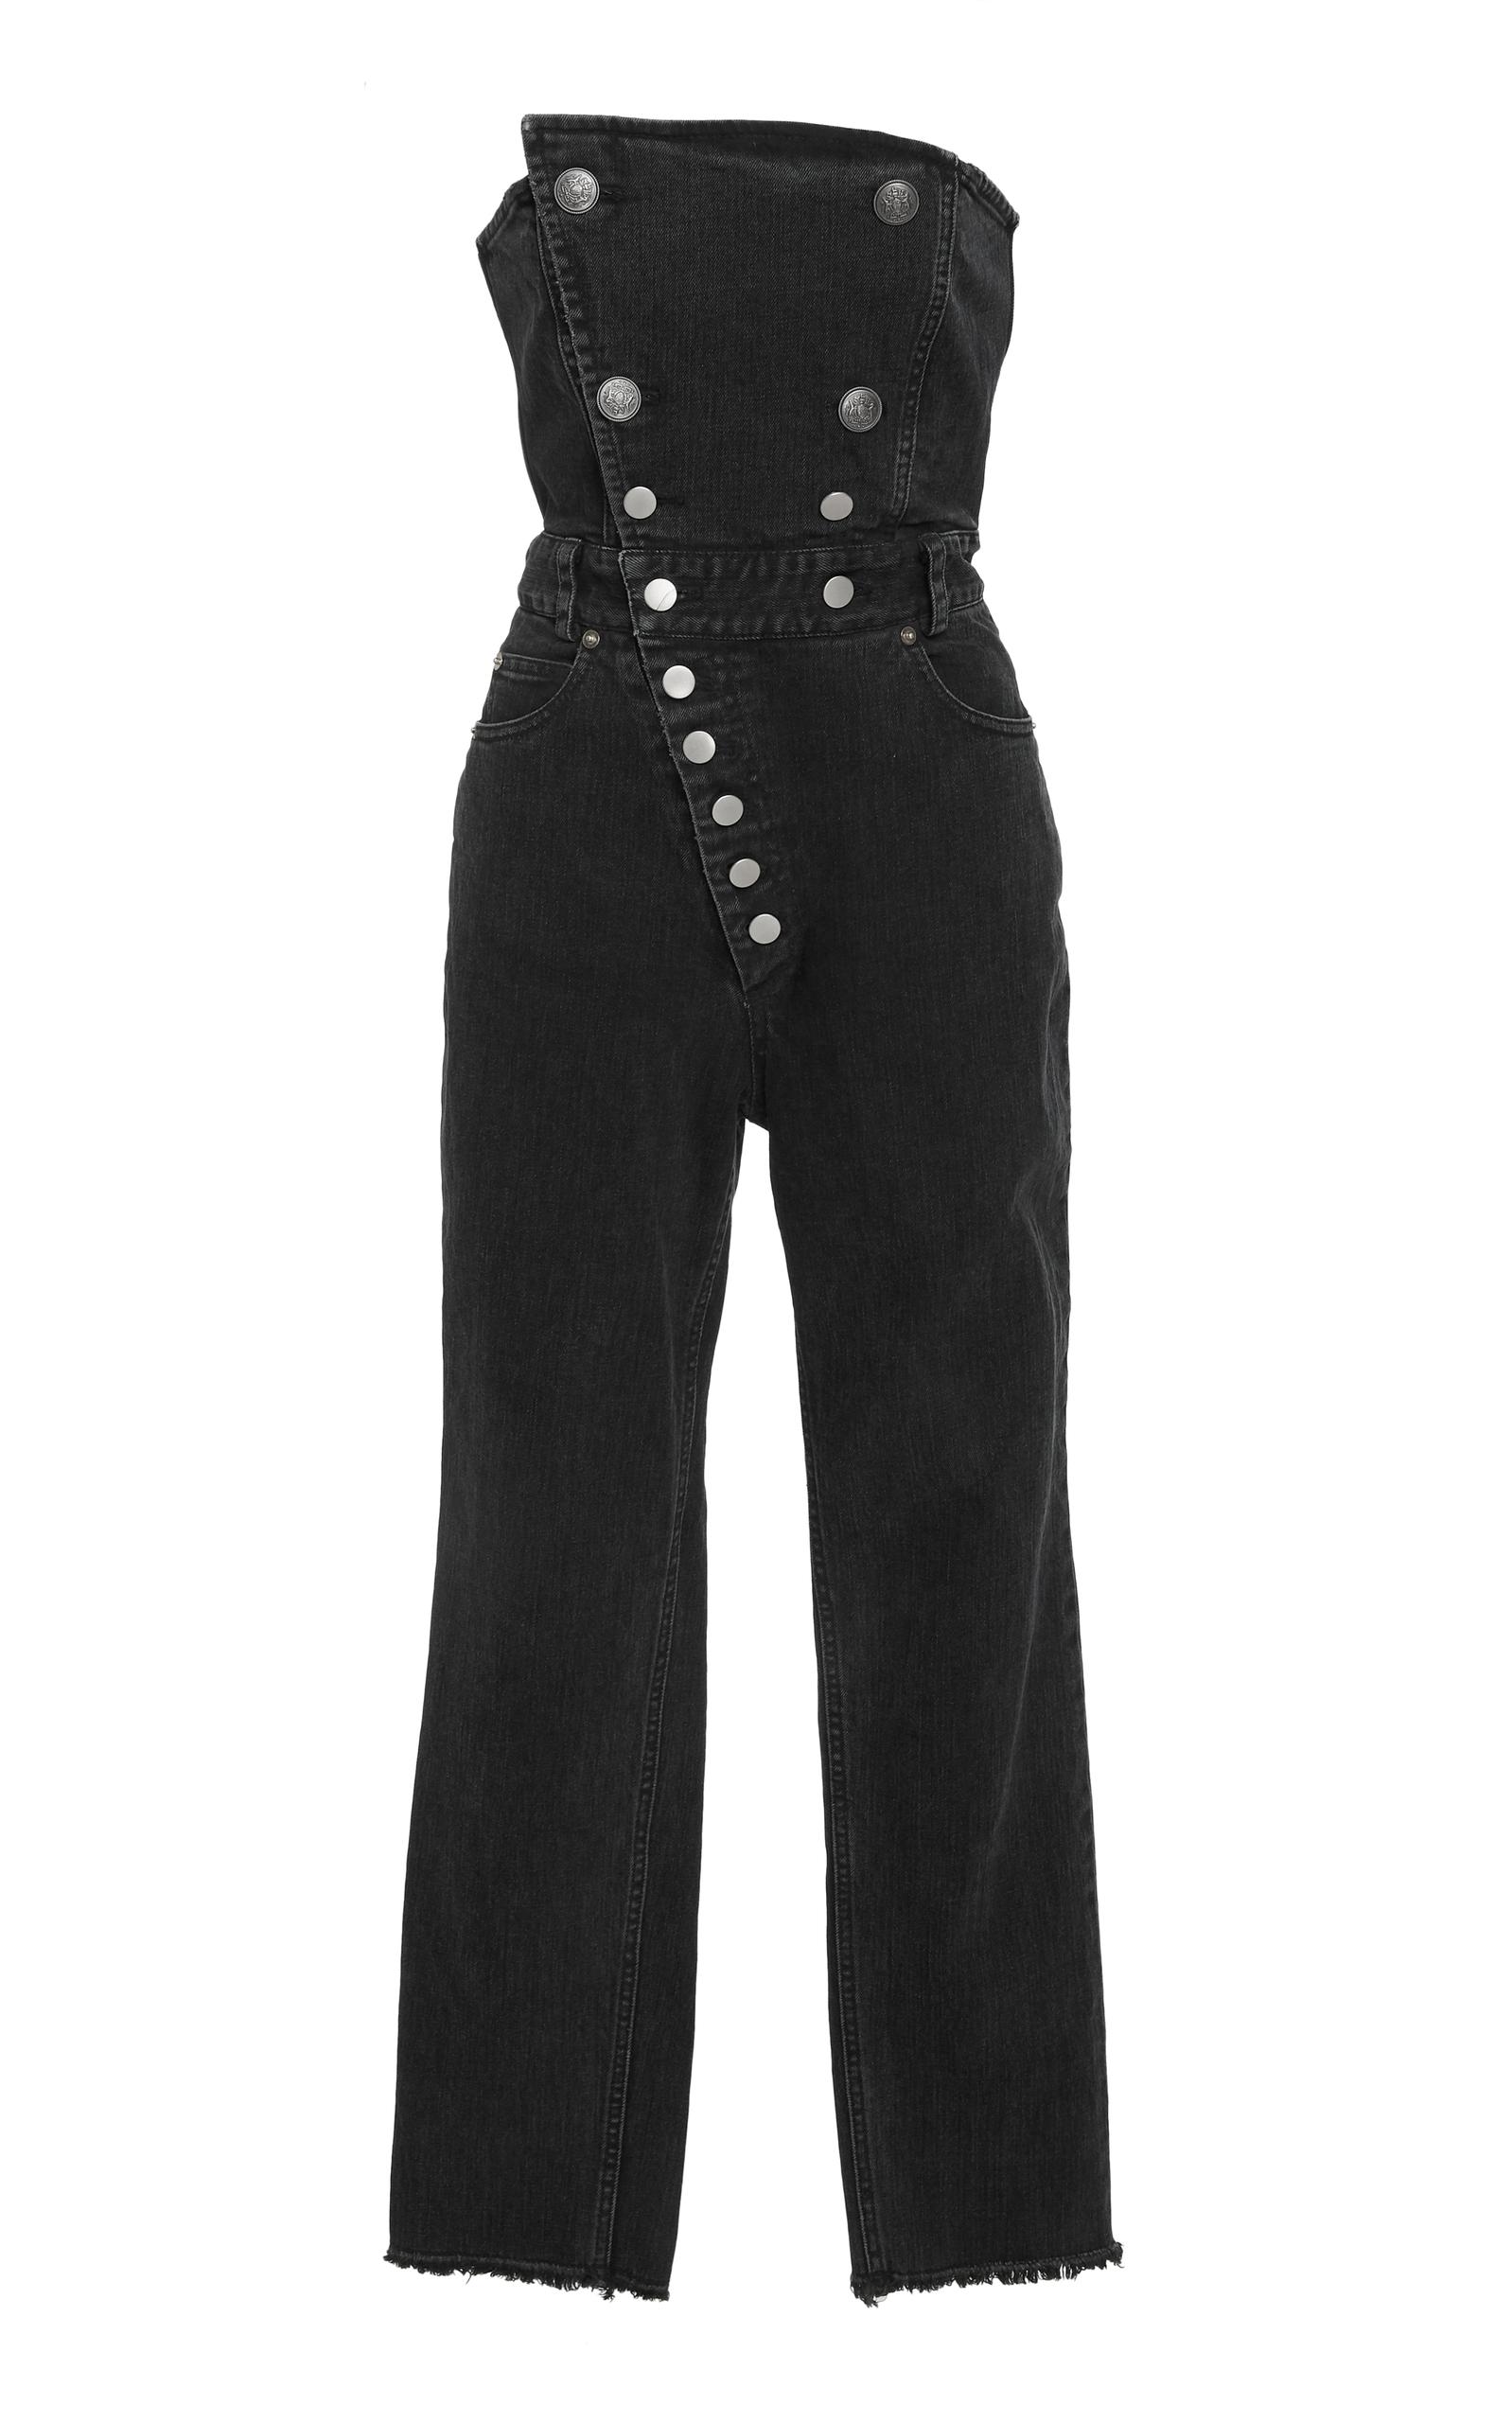 41f0f08ff16 Marissa WebbMyles Strapless Denim Jumpsuit. CLOSE. Loading